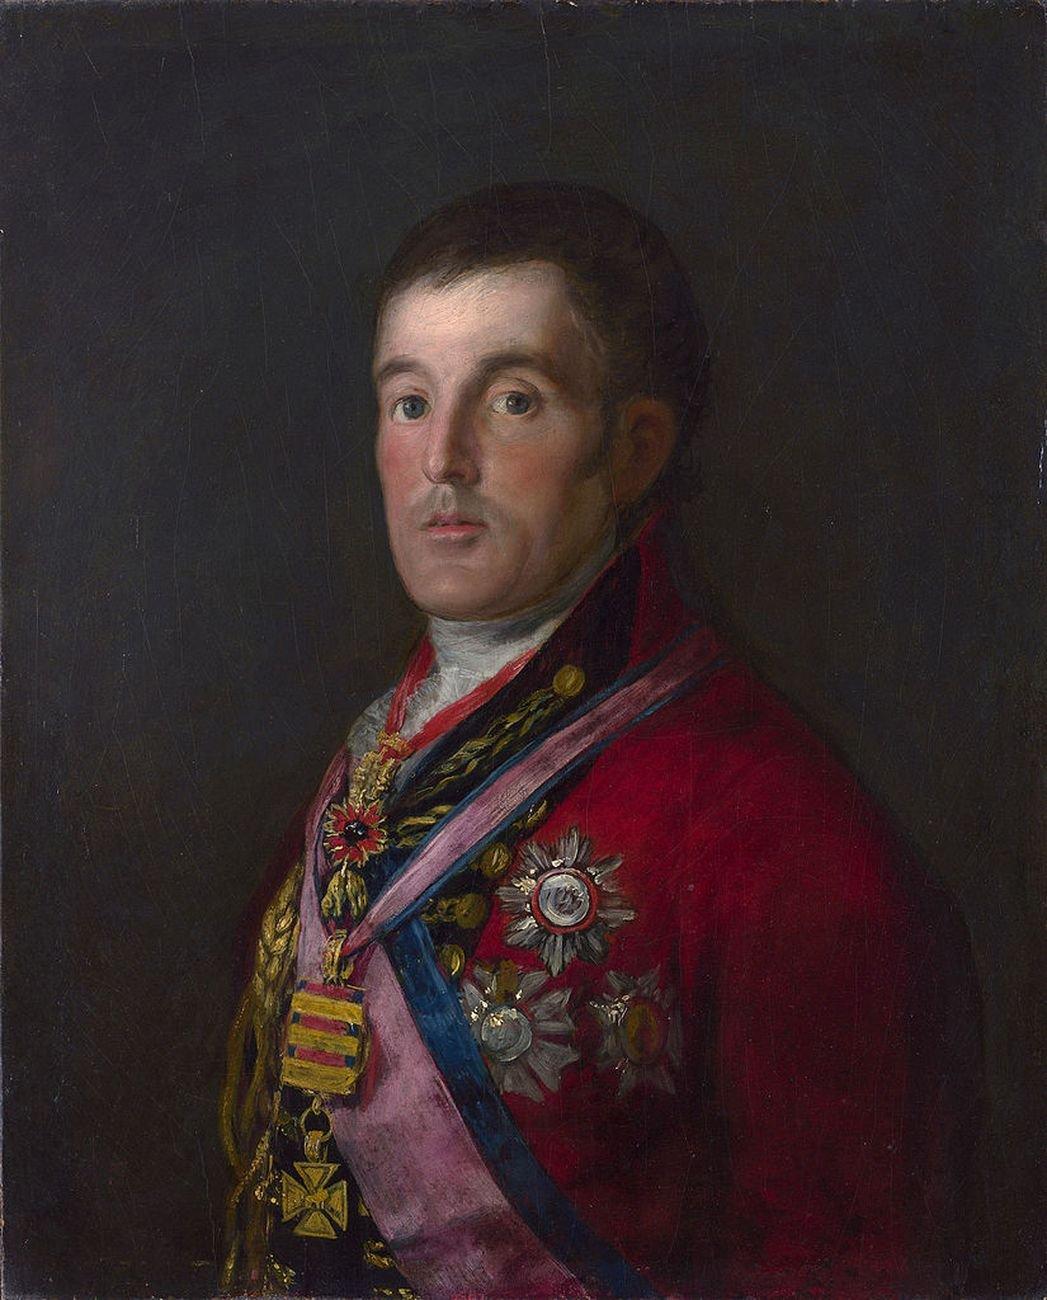 Francisco de Goya, Ritratto del Duca di Wellington, 1812, olio su tavola, cm 64,3x54,2. National Gallery, Londra